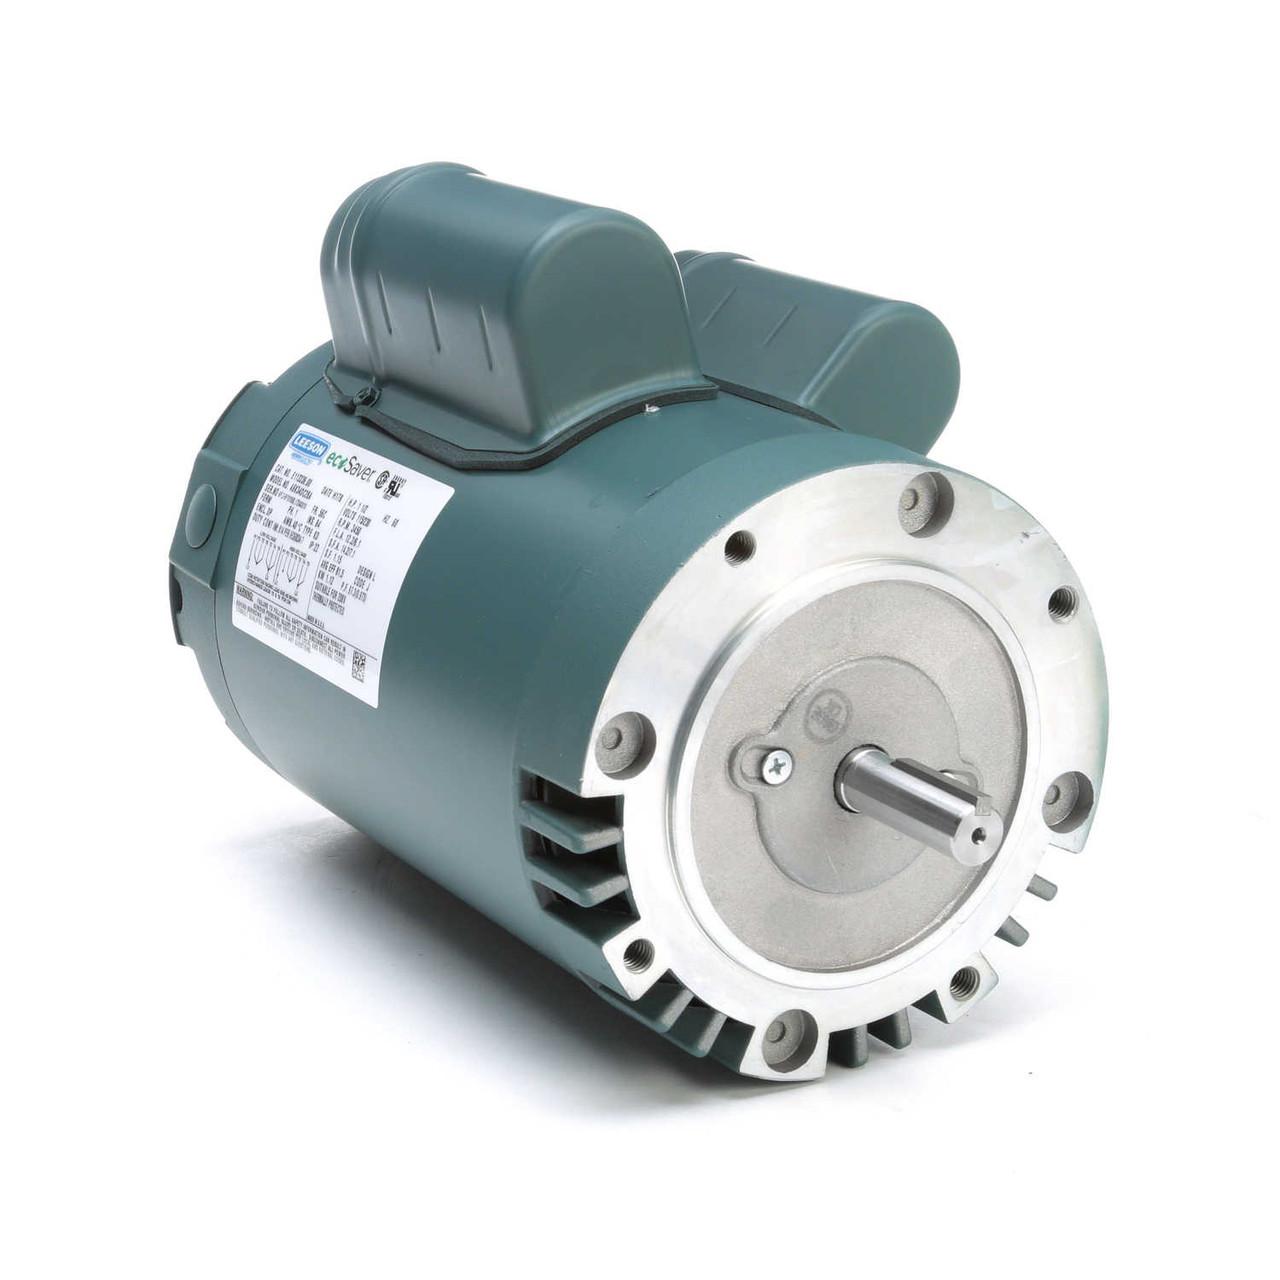 Electric Motor 1.5HP 56C 1 phase TEFC 115//230V 3600RPM 60Hz Keyed shaft